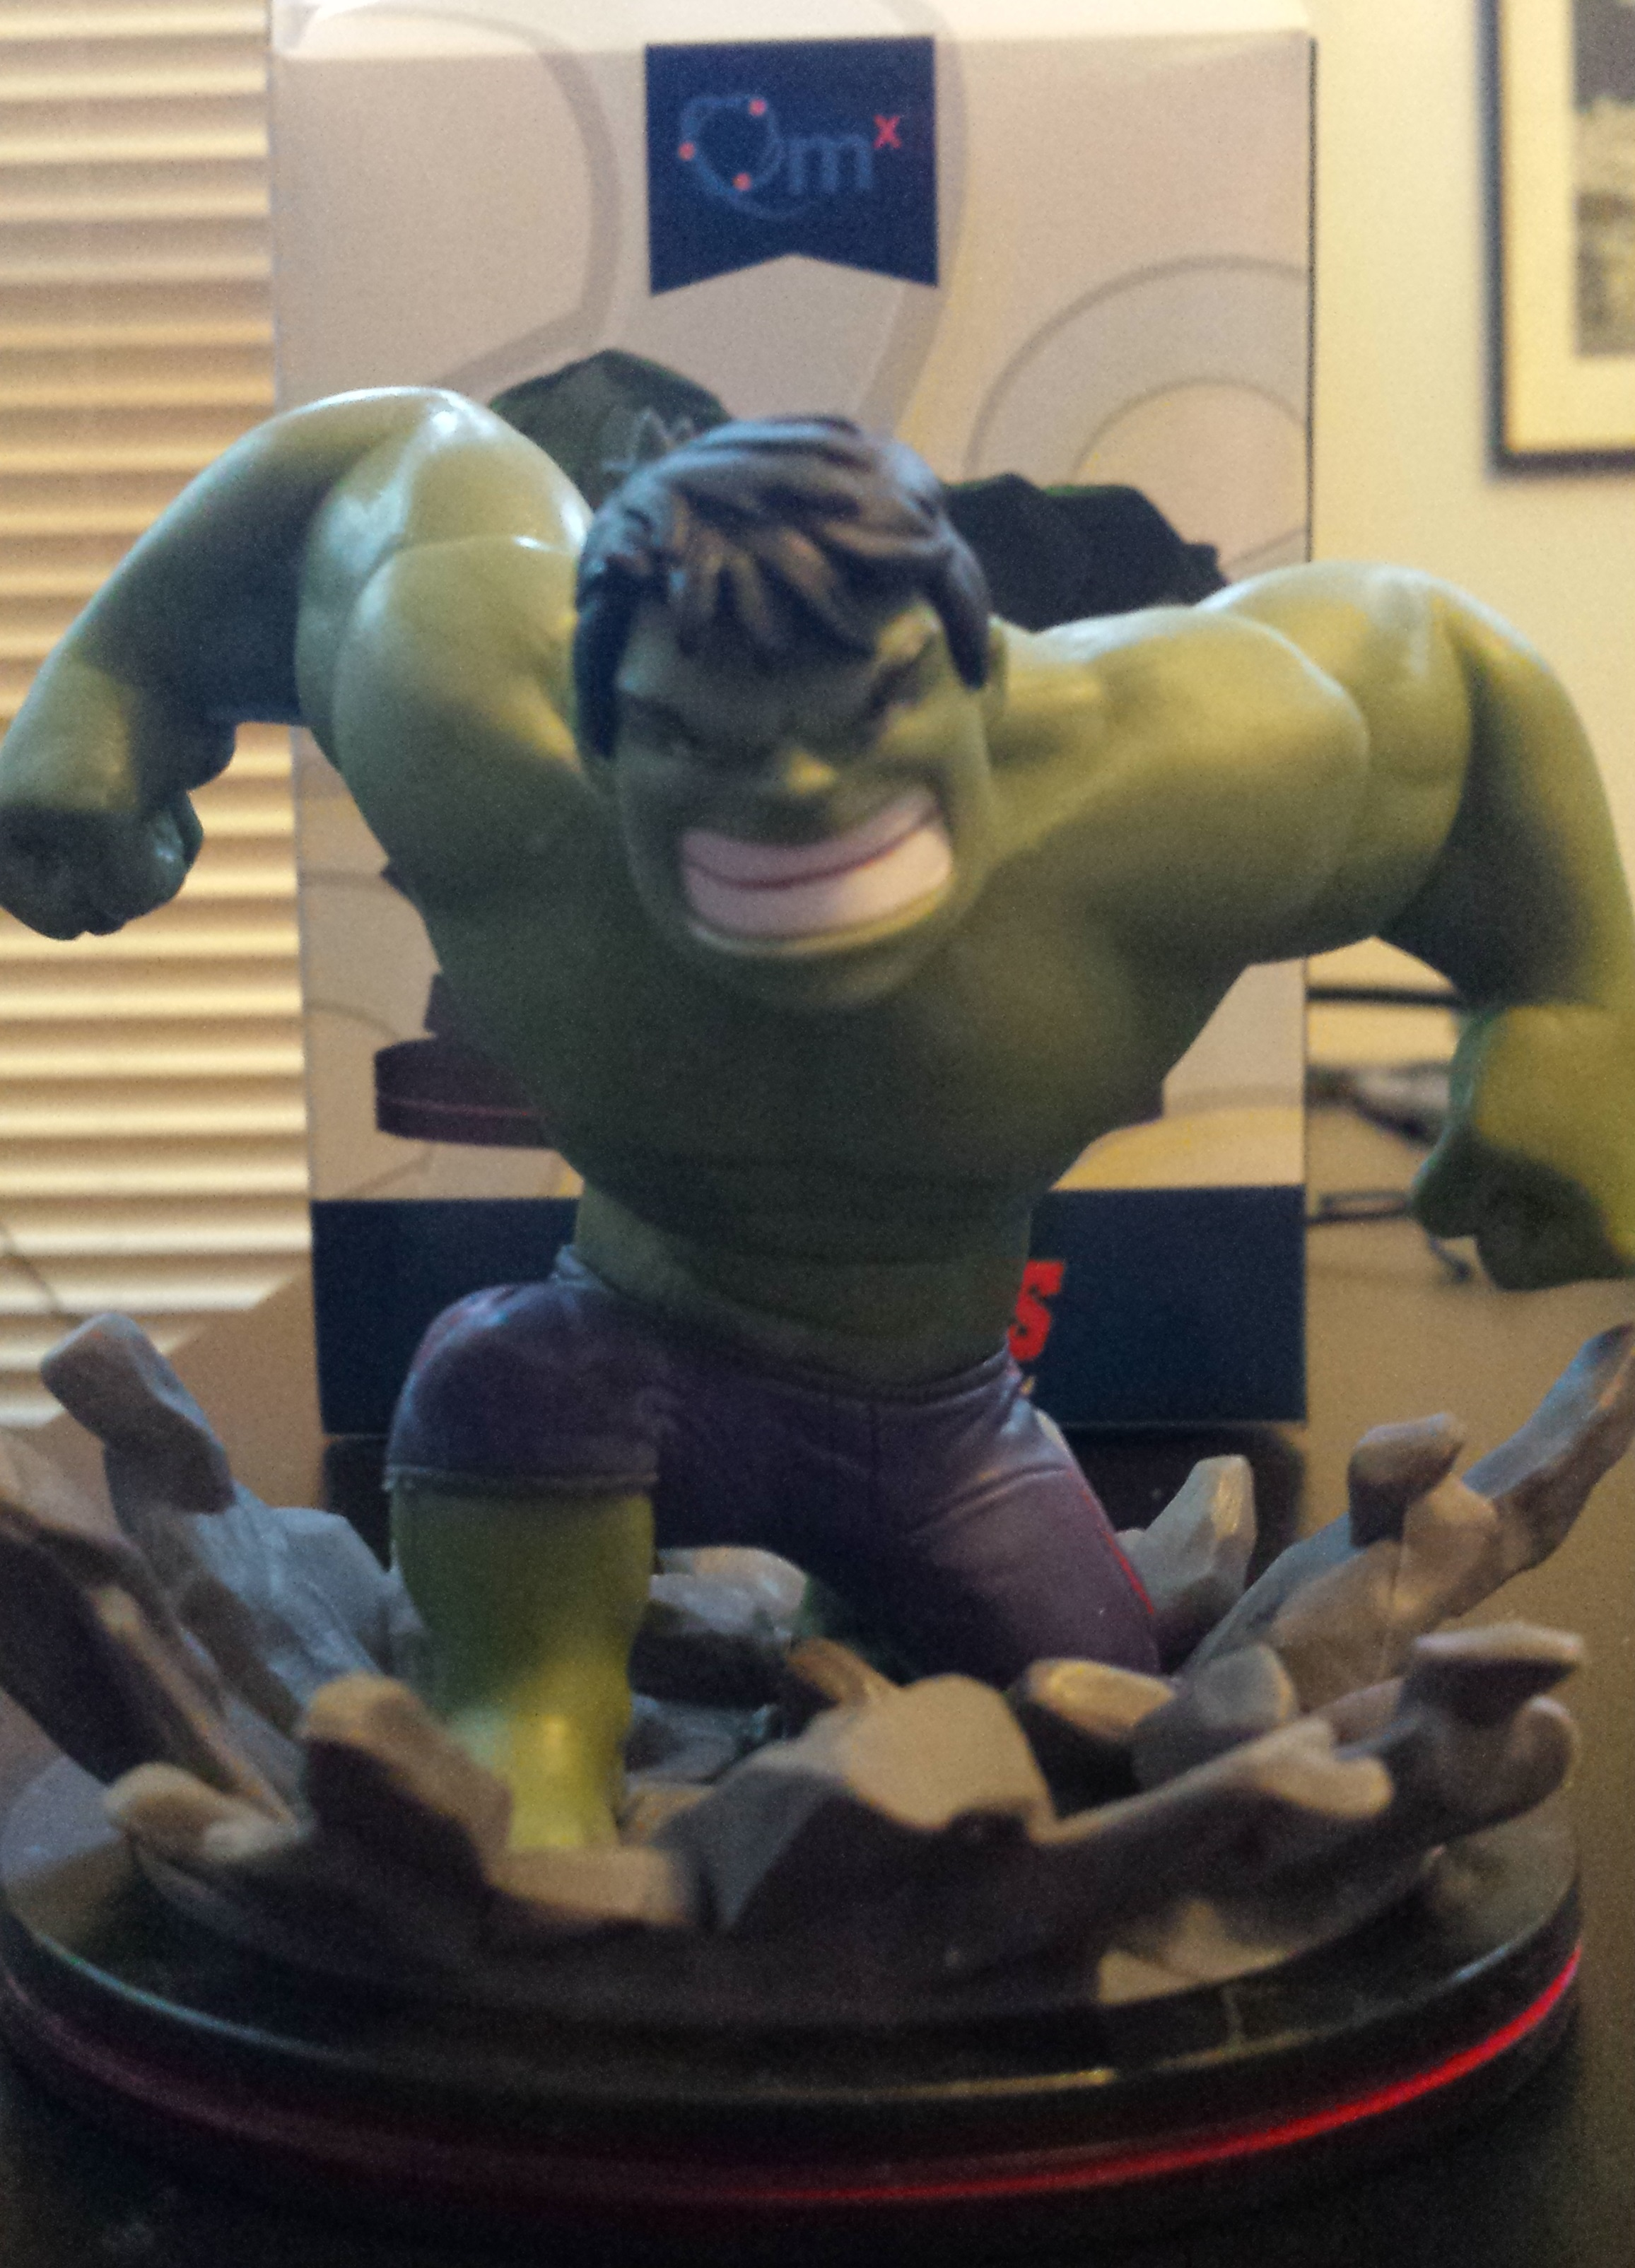 May's loot crate, power, the hulk